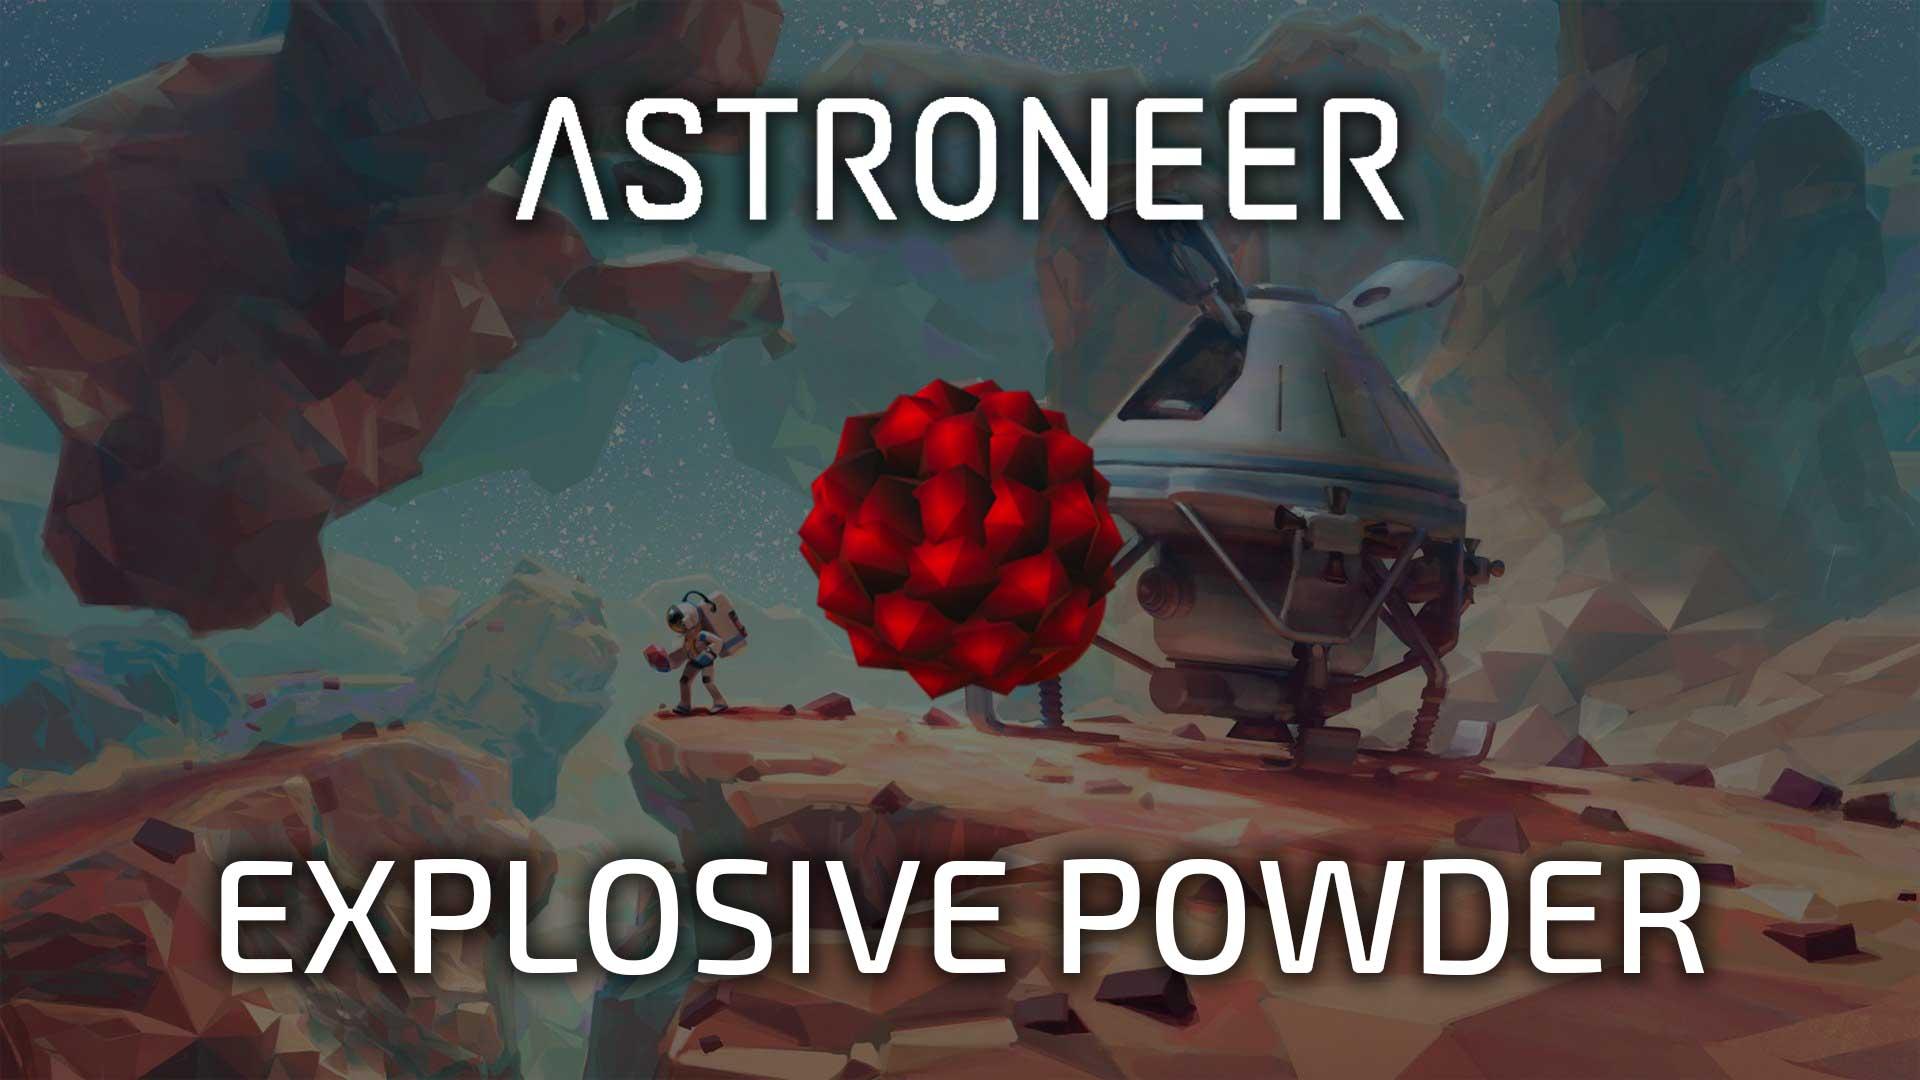 astroneer explosive powder